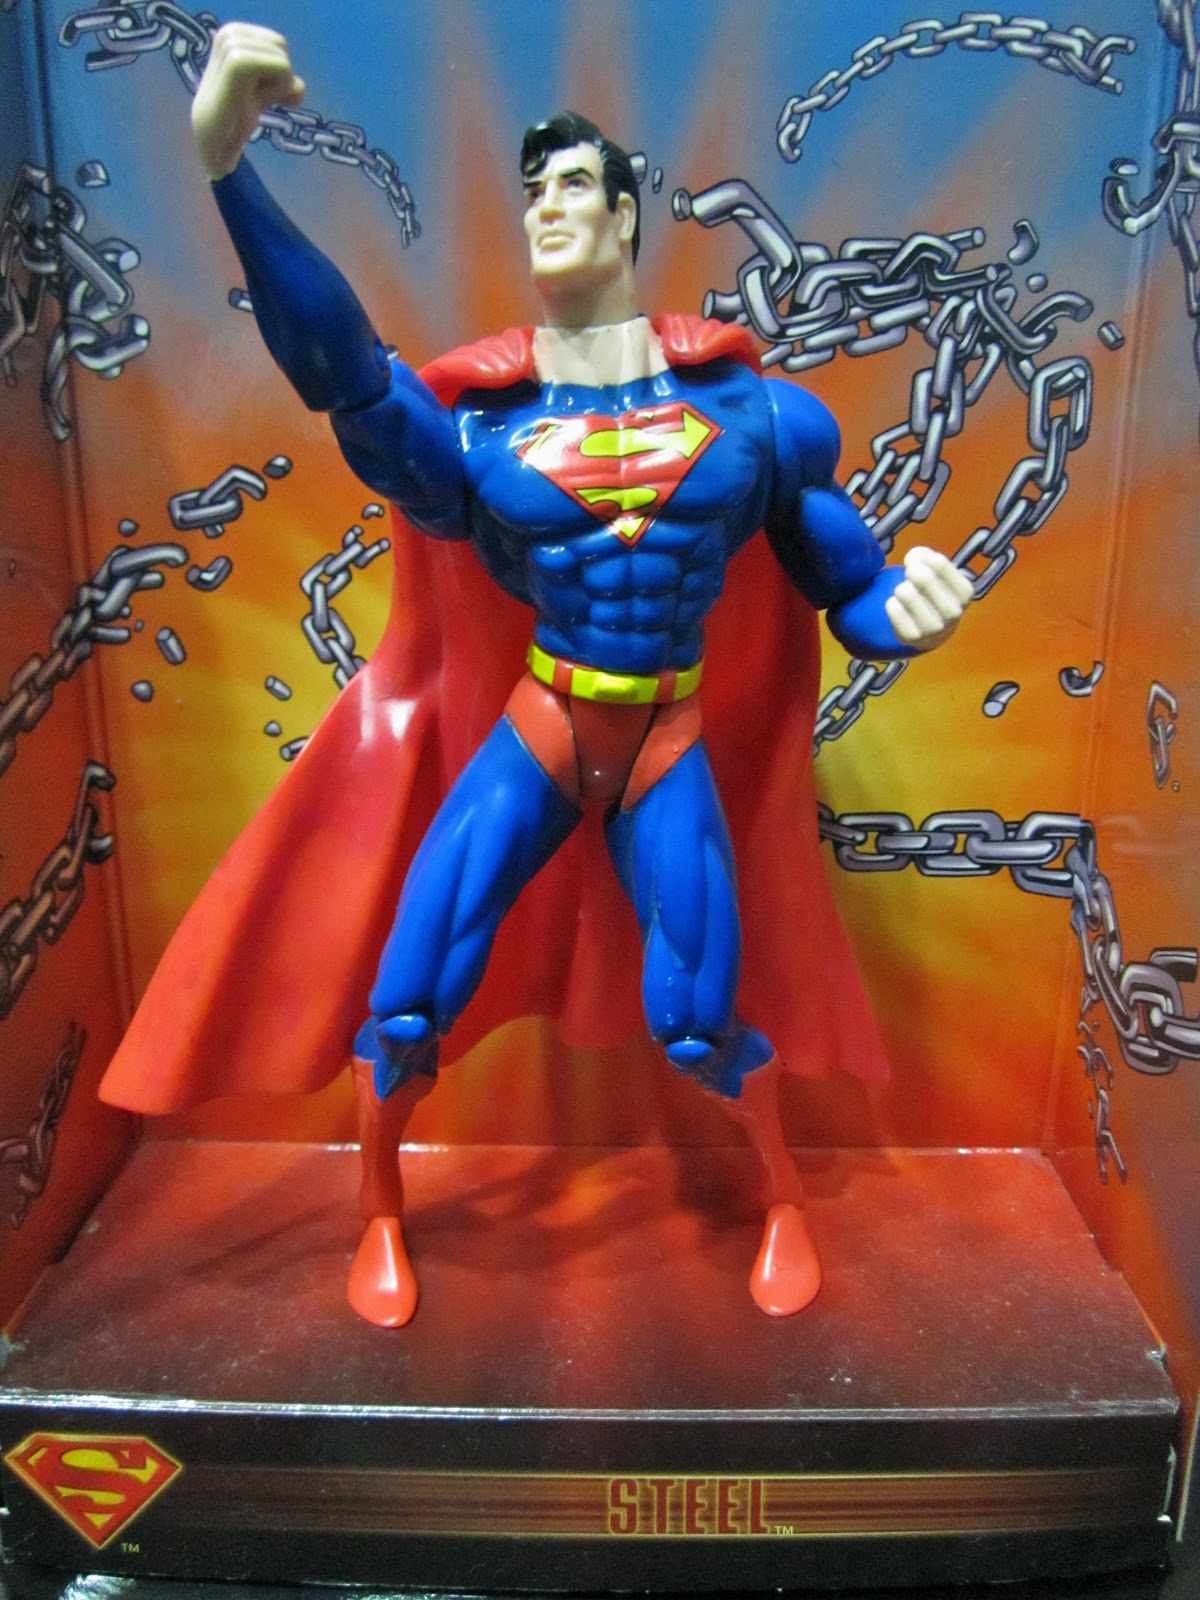 Figurine Hasbro Hasbro Superman Superman Superman Figurine Superman Figurine Figurine Hasbro Superman Figurine Superman Hasbro Hasbro OiZkuXTwP